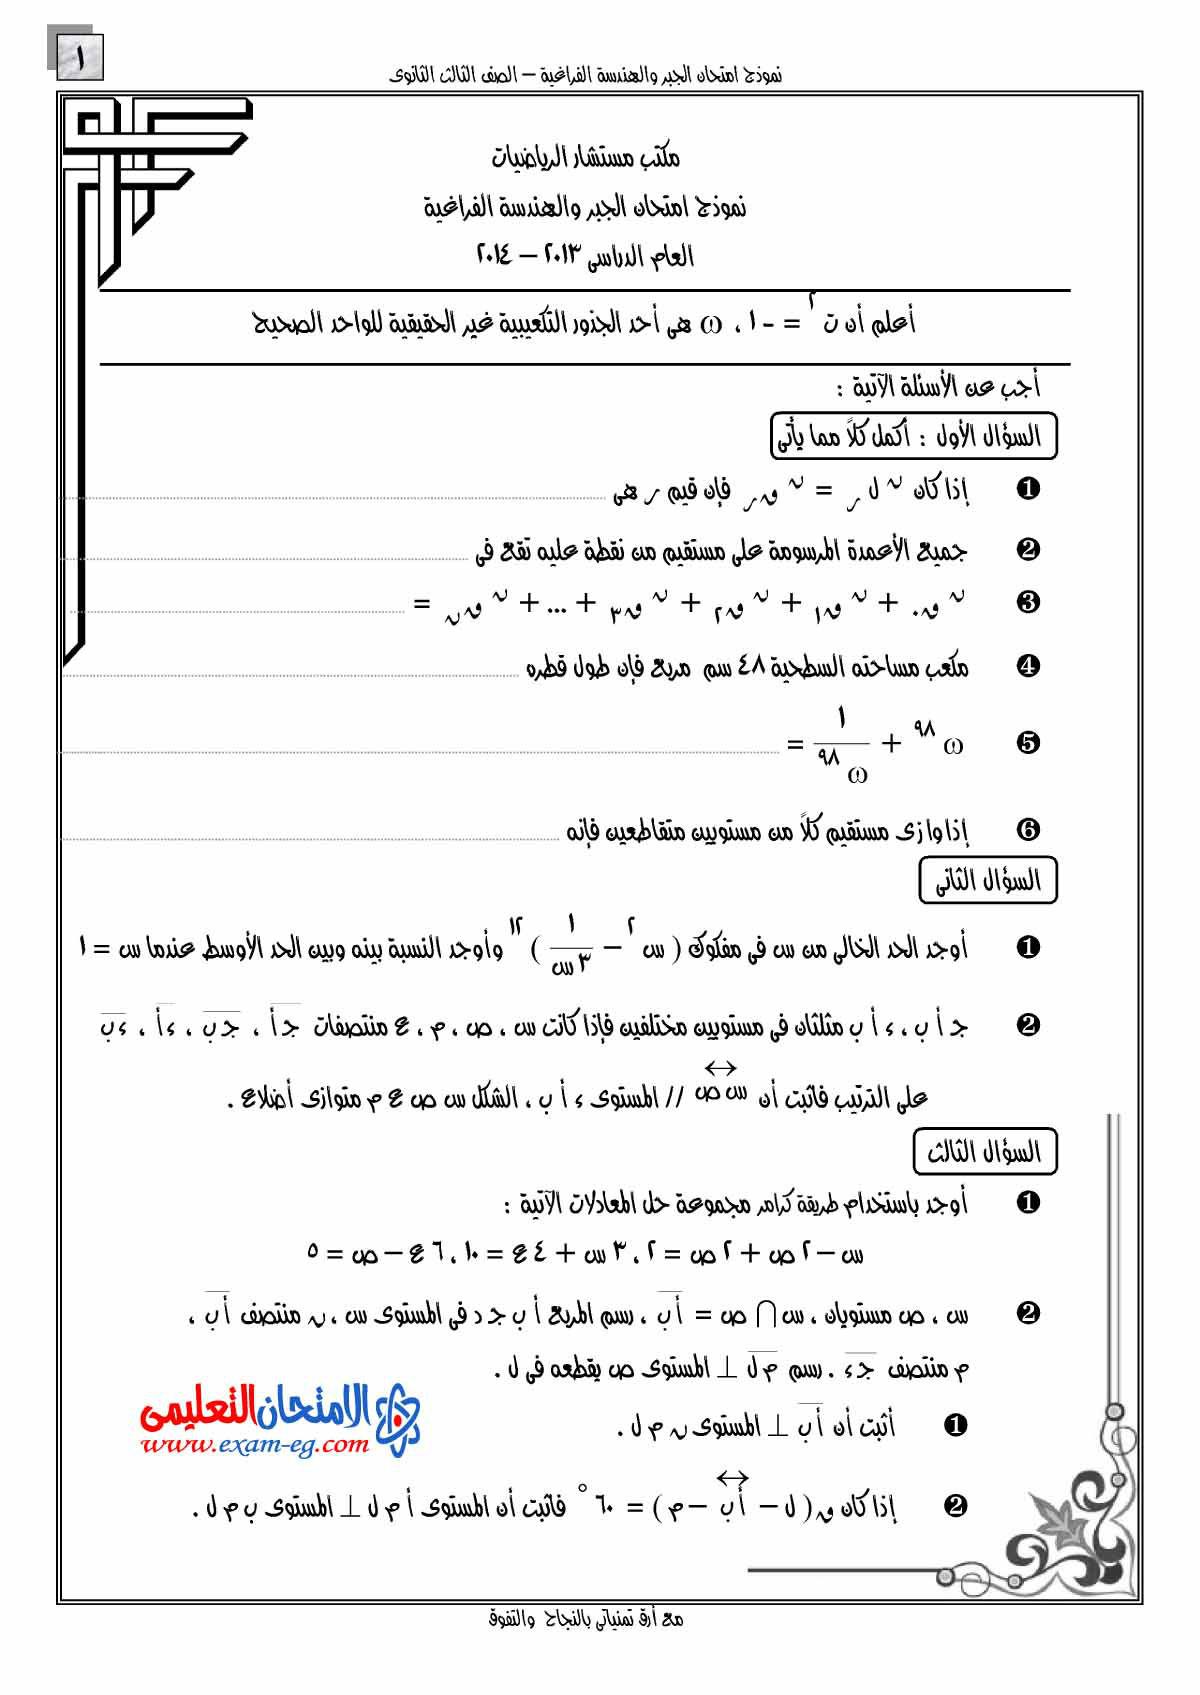 exam-eg.com_140333253941.jpg